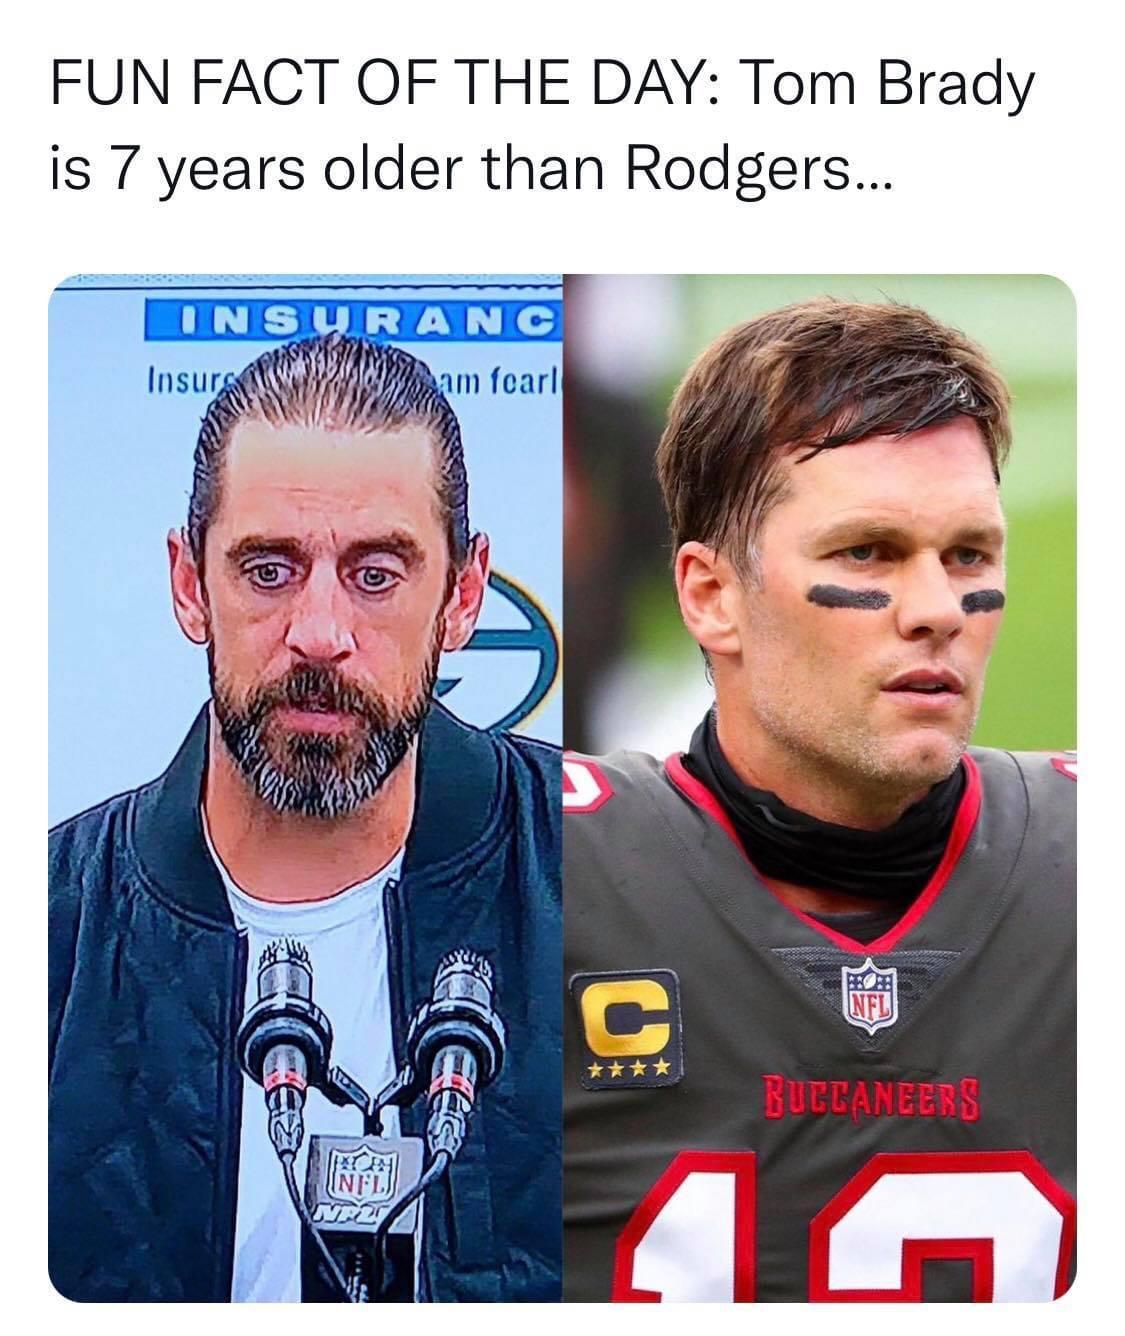 Tom Brady is 7 years older than Rodgers meme